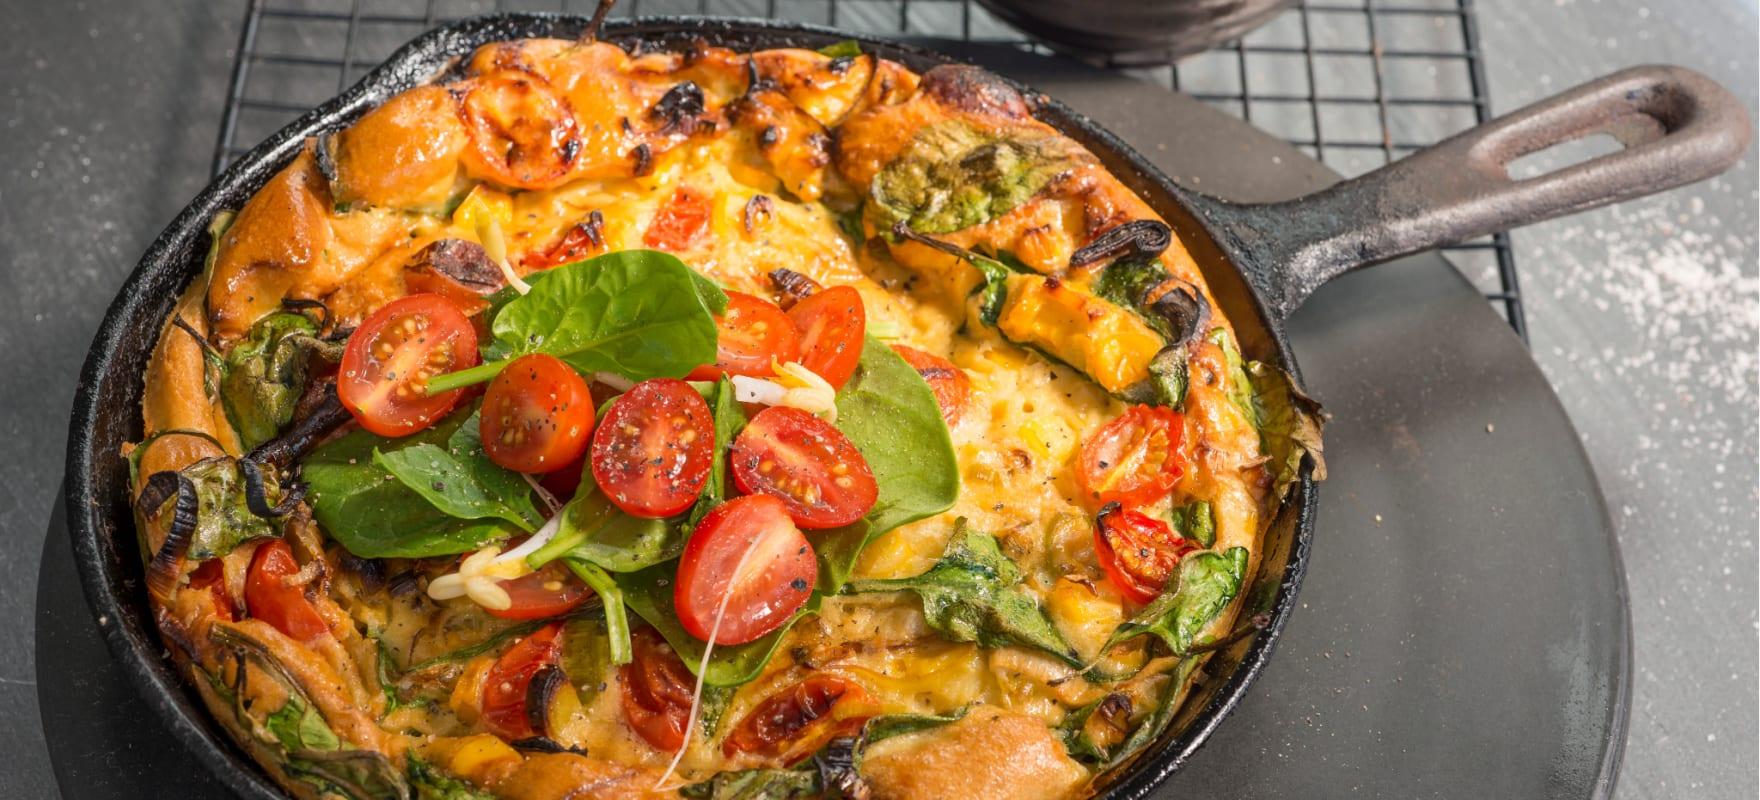 Vegetable bake image 2